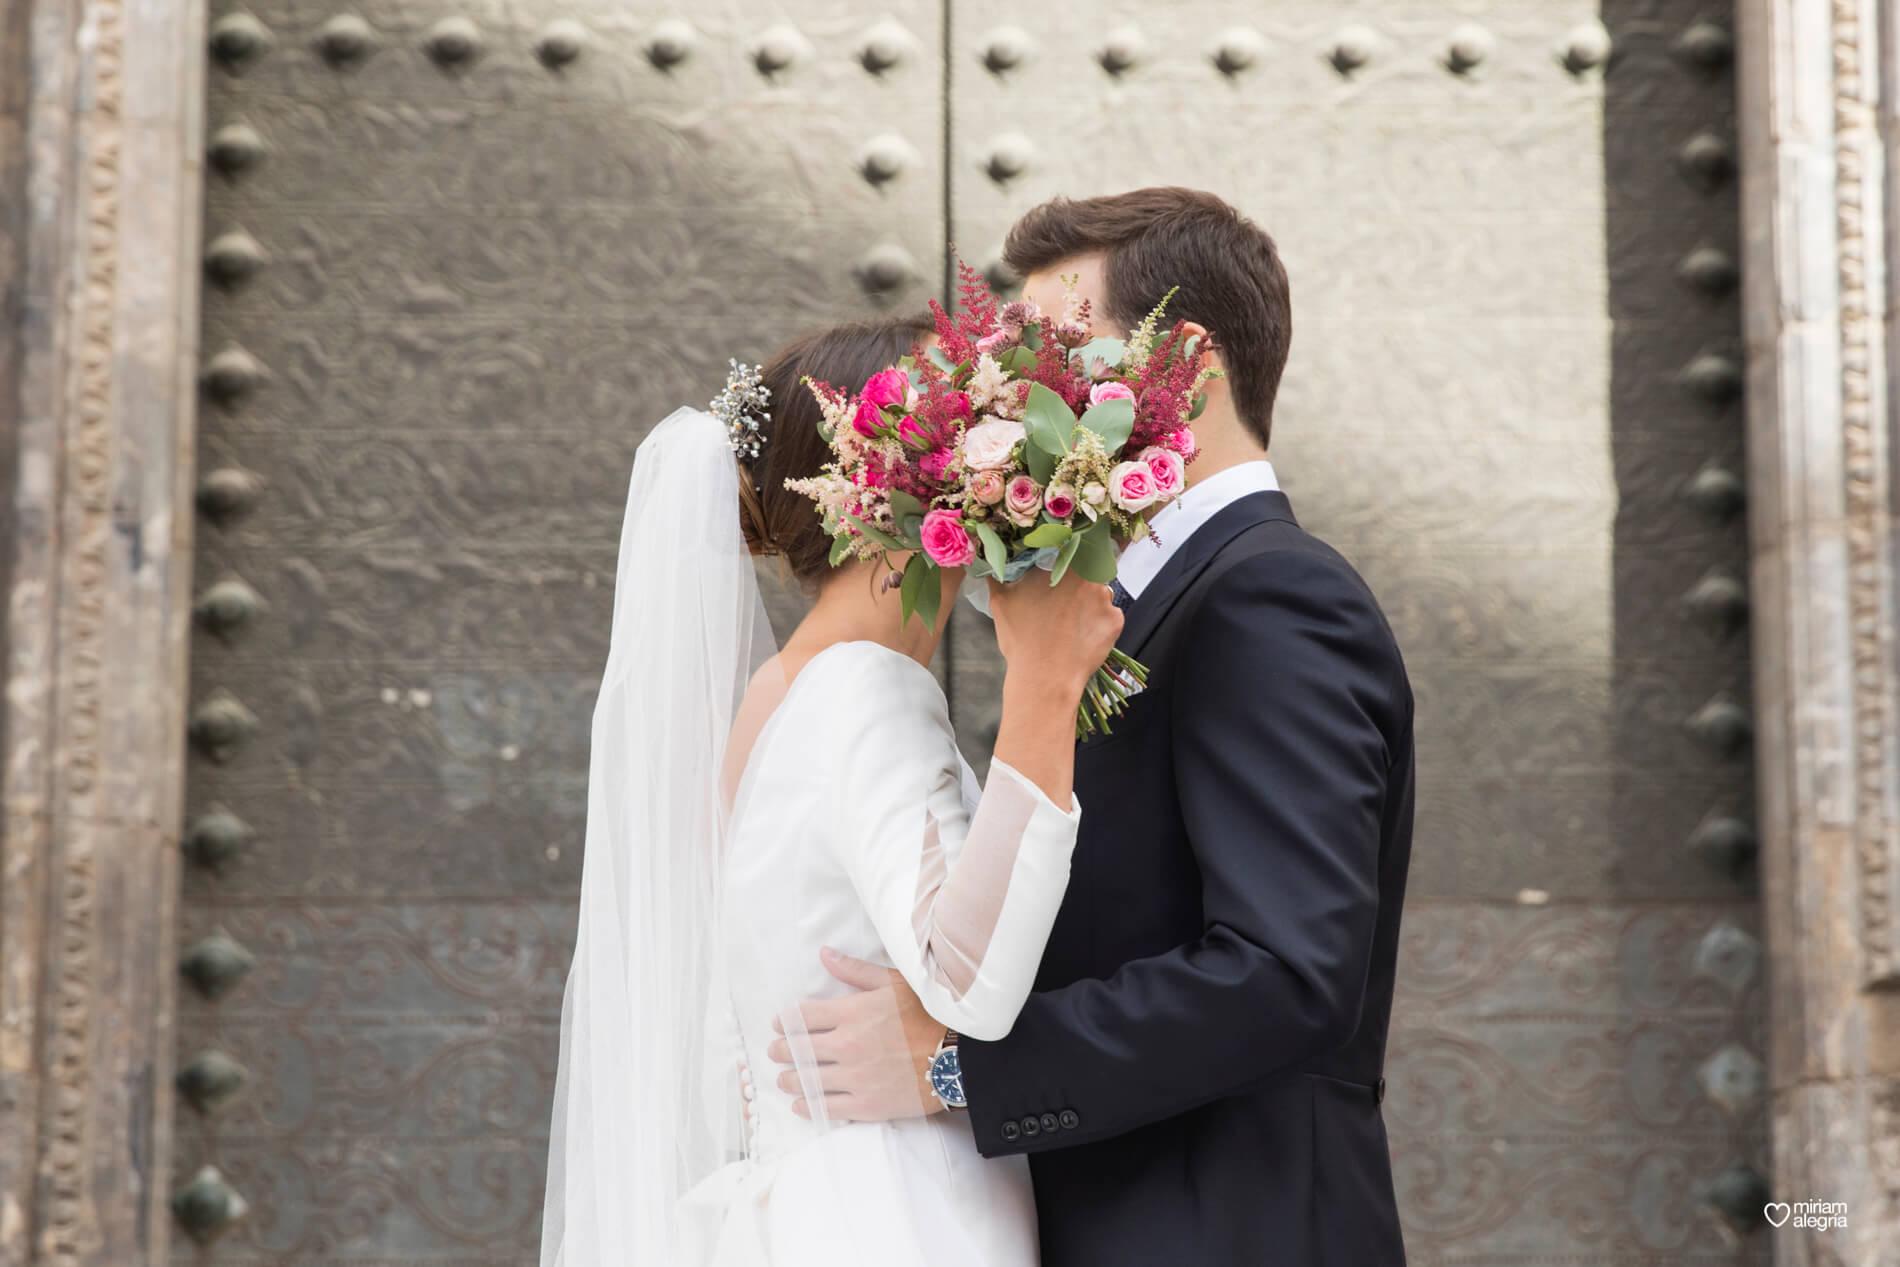 vestido-de-novia-paula-del-vas-miriam-alegria-fotografos-boda-murcia-90